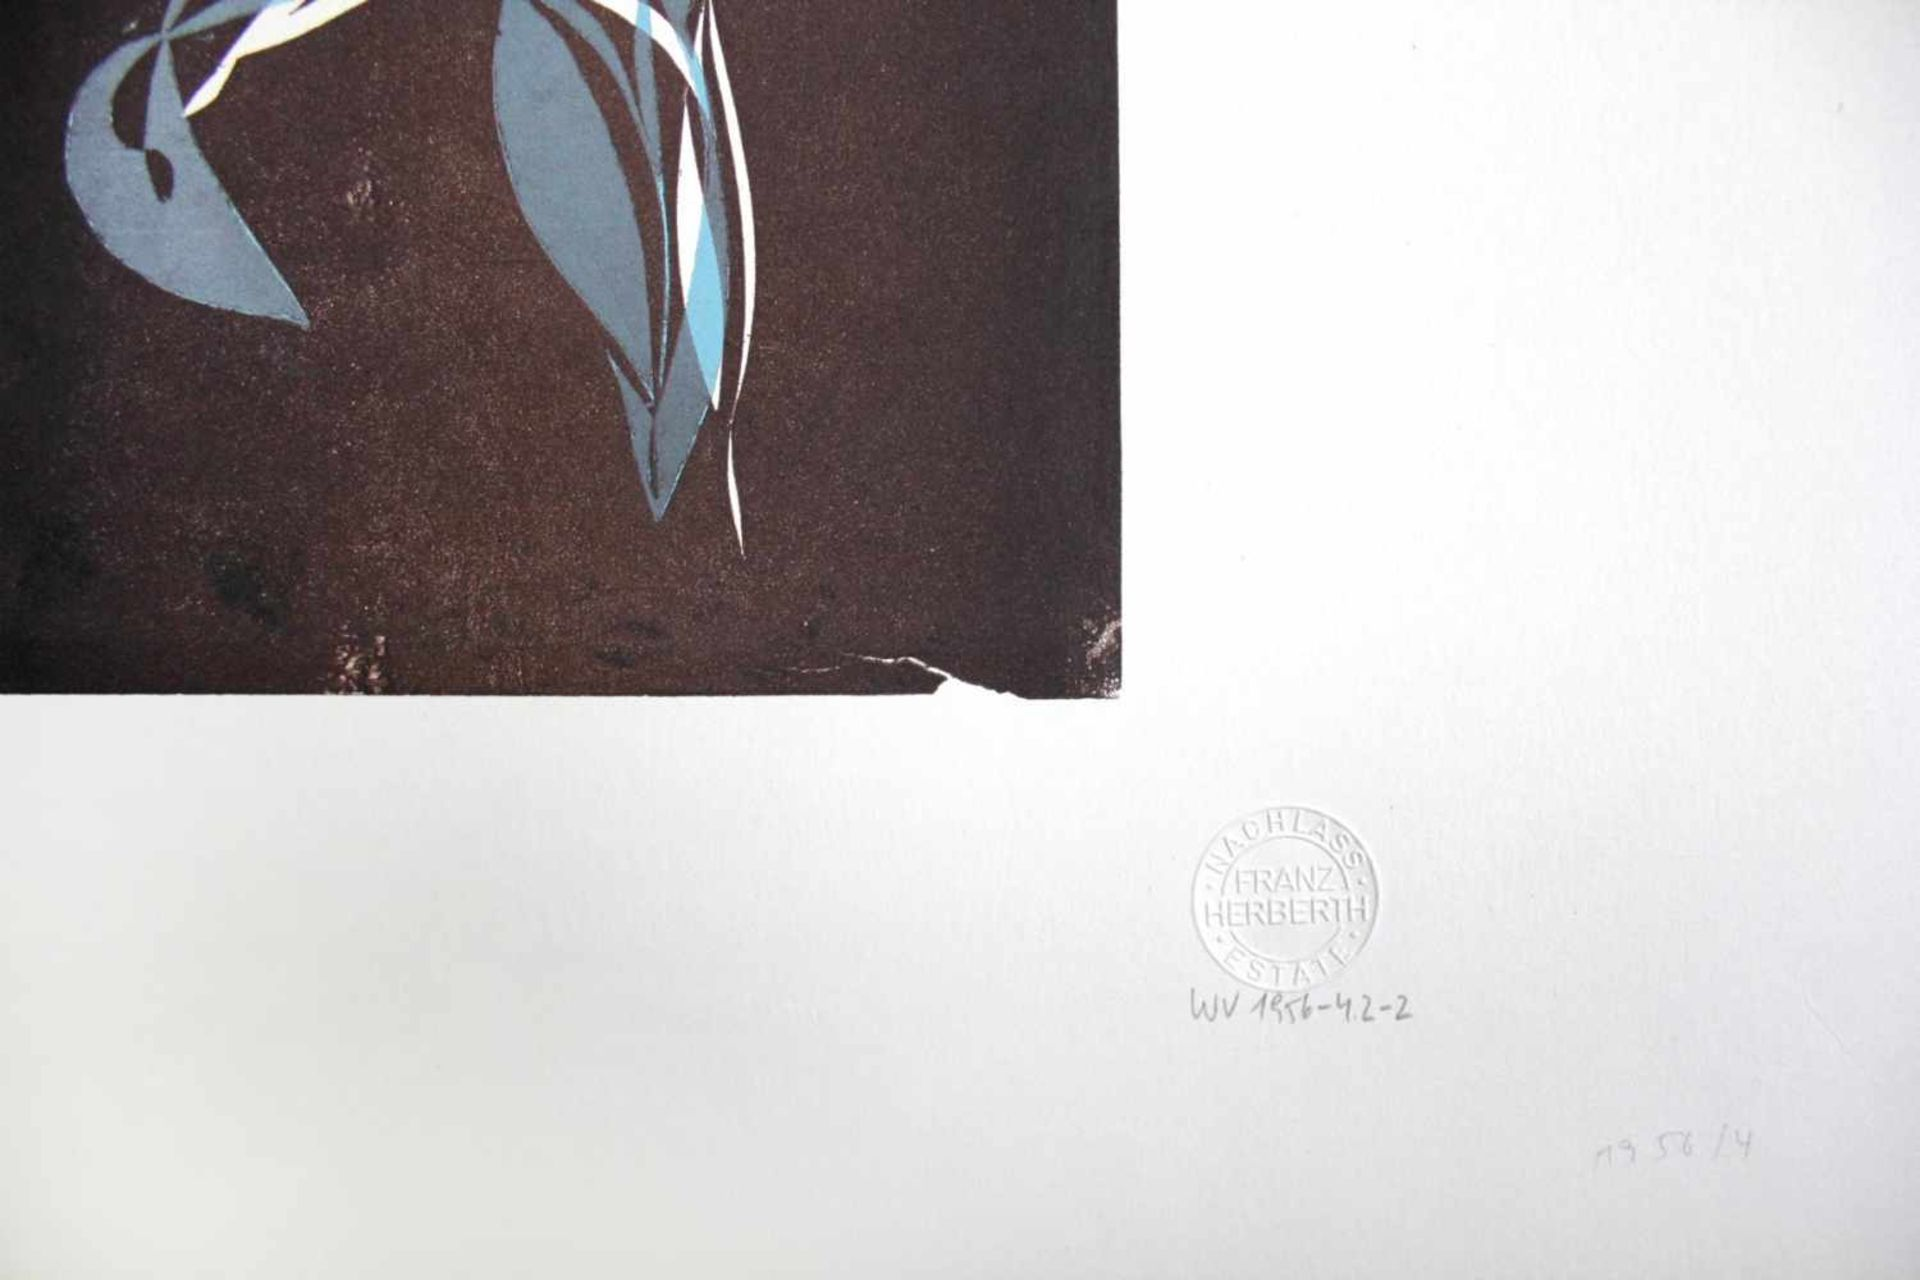 Franz Herbert geb. 1953 o.T. Linolschnitt Nachlass-Prägestempel 57 x 44 cm - Bild 2 aus 2